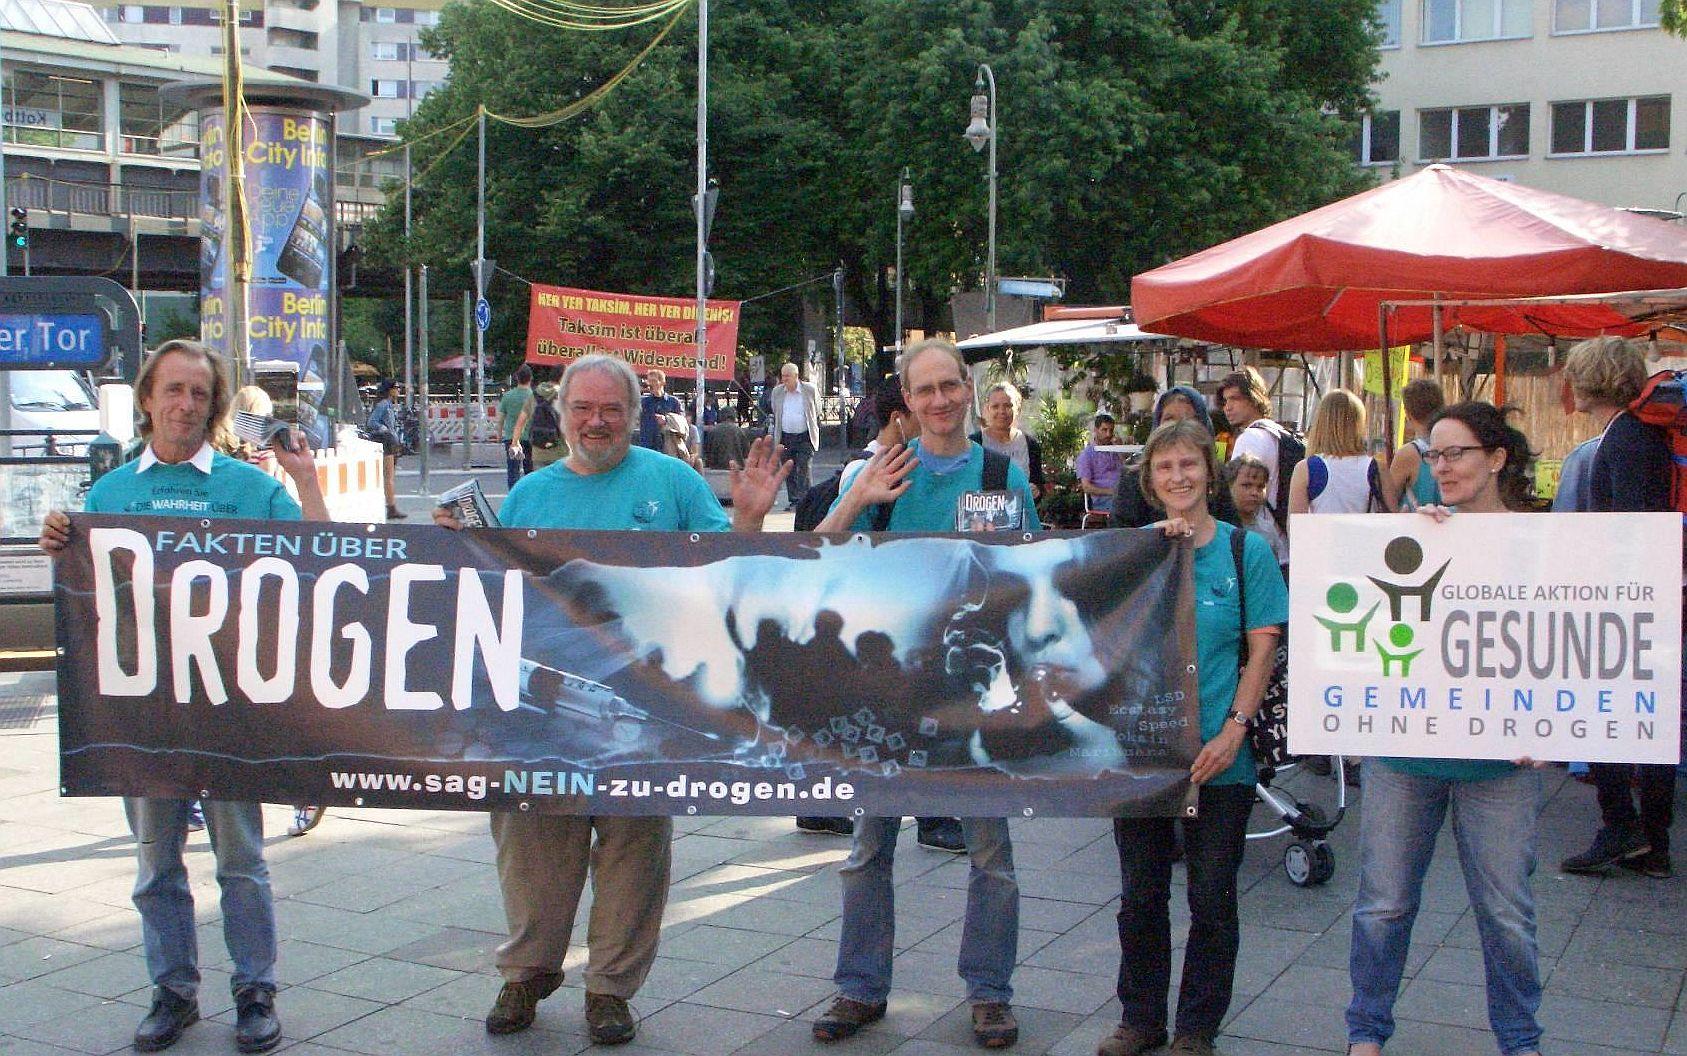 Sag Berlin church of scientology berlin promotes free living